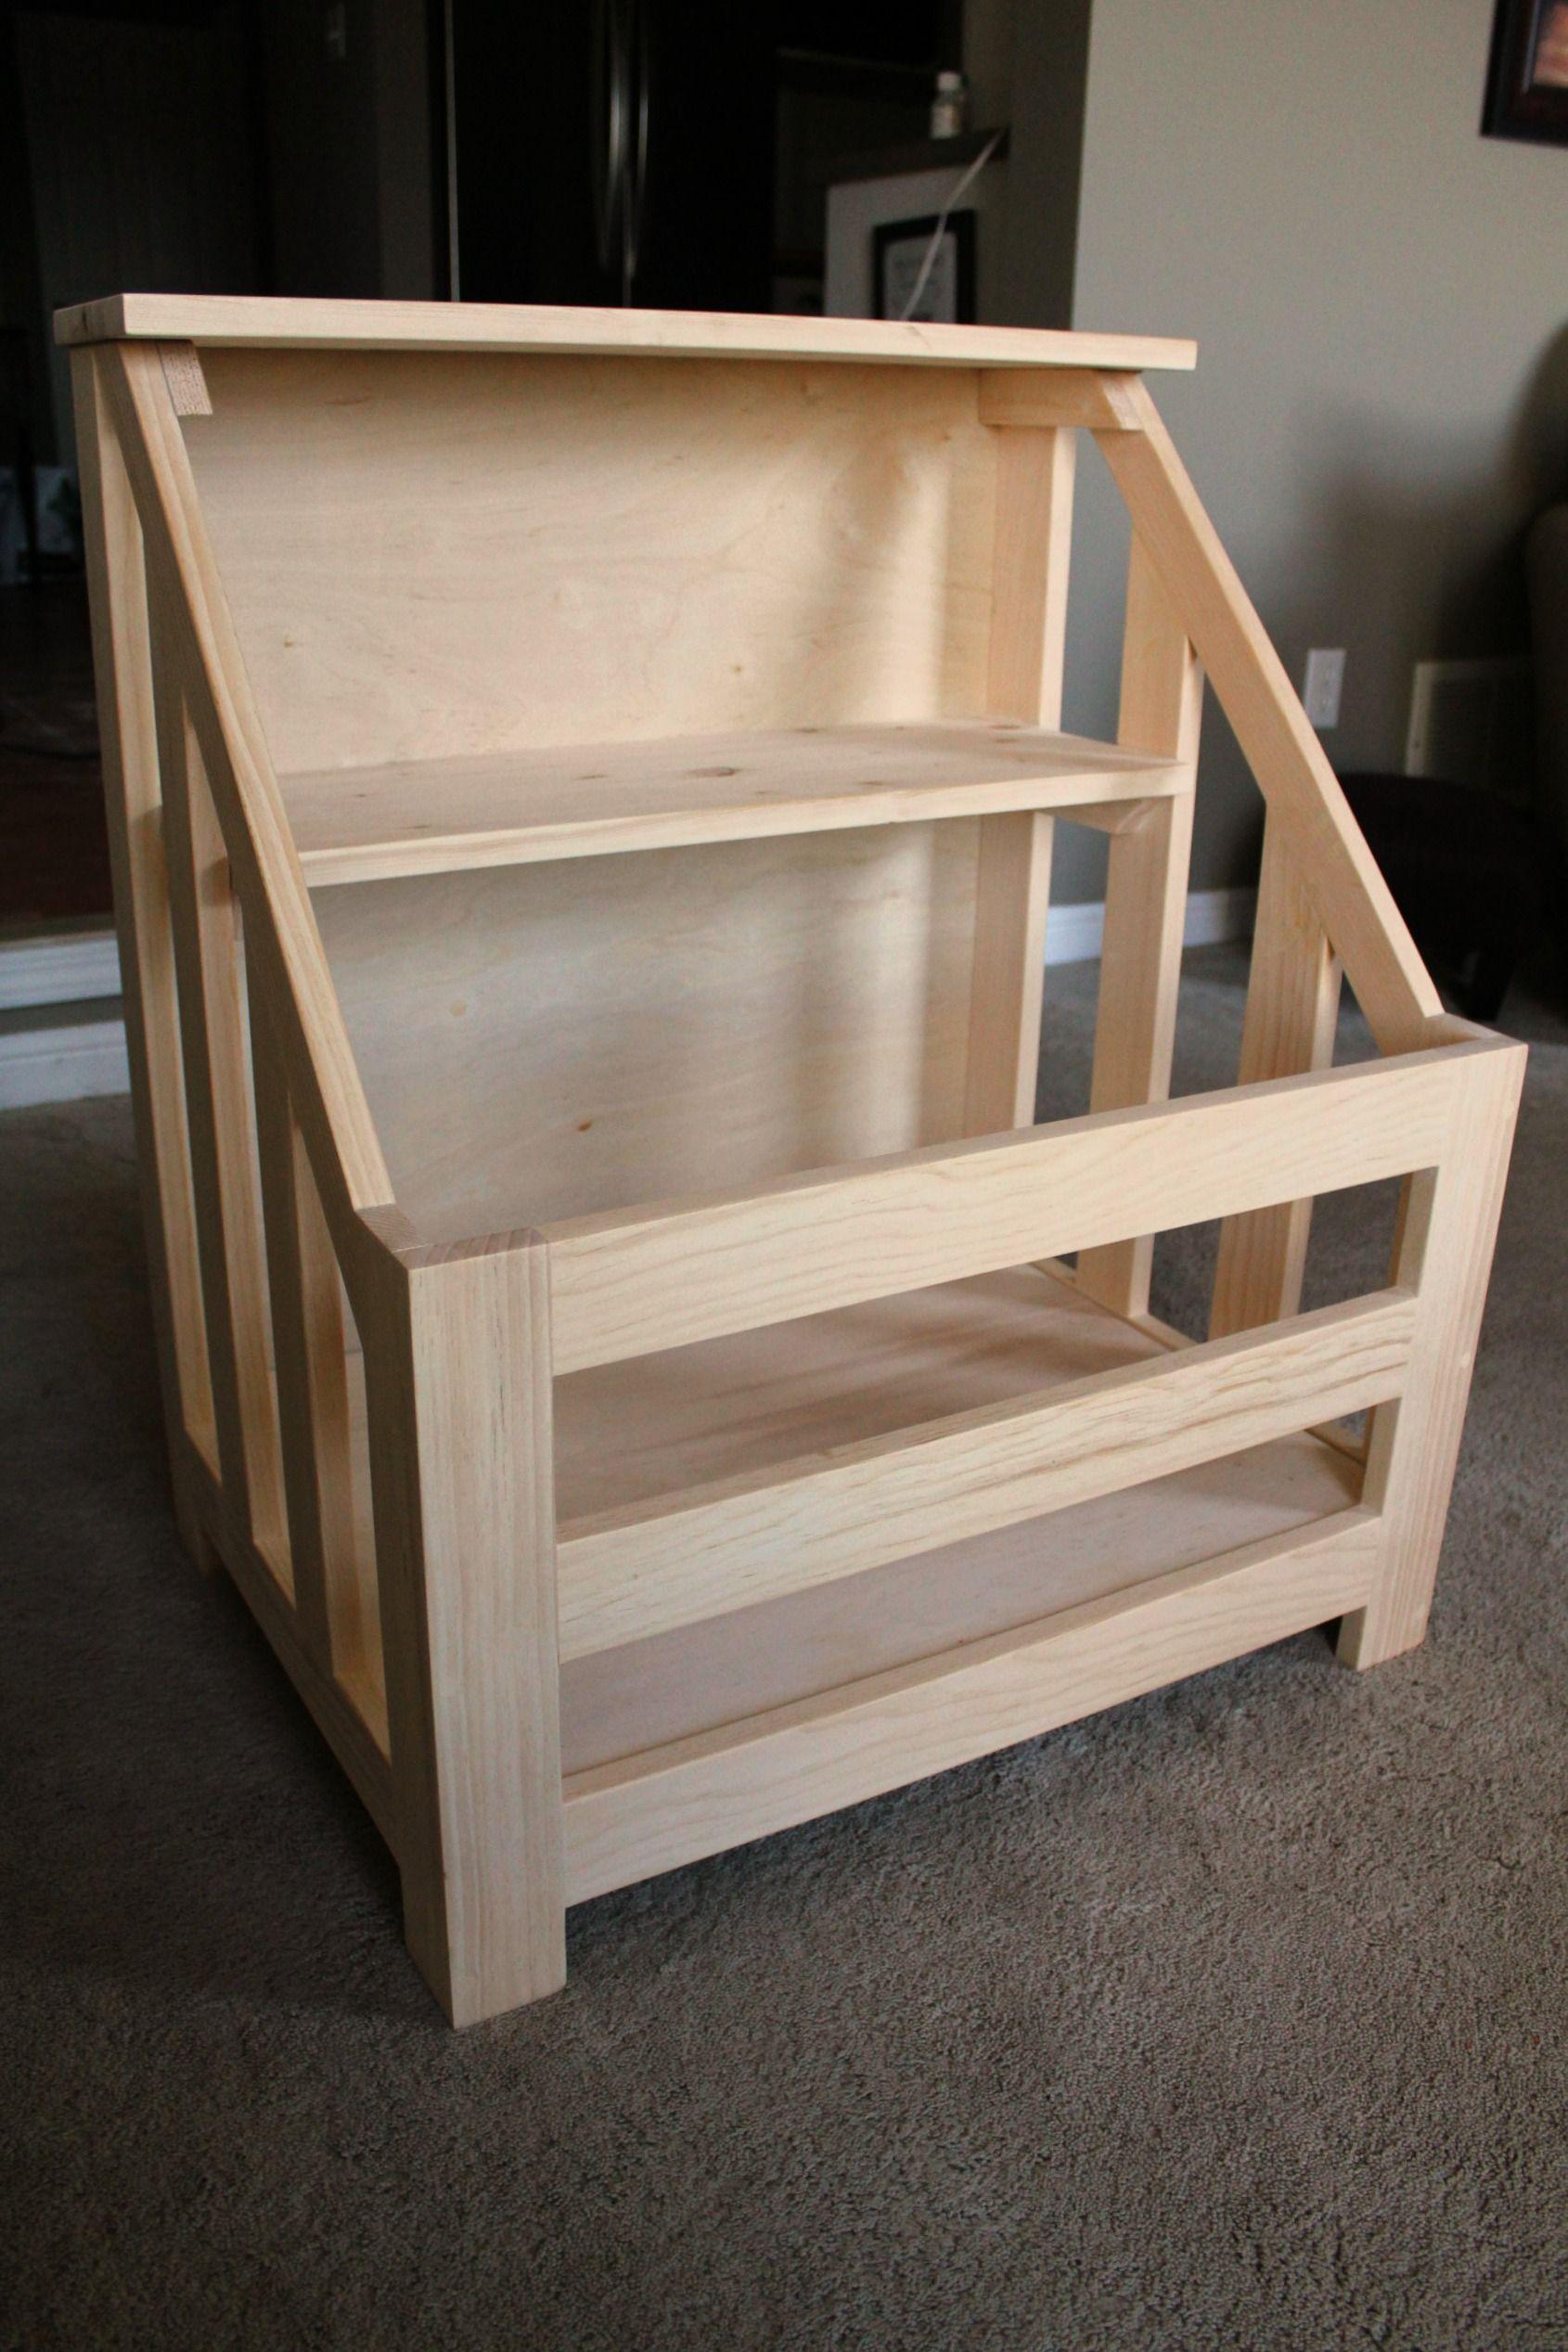 Diy toy box bookshelf i plan to recreate this using